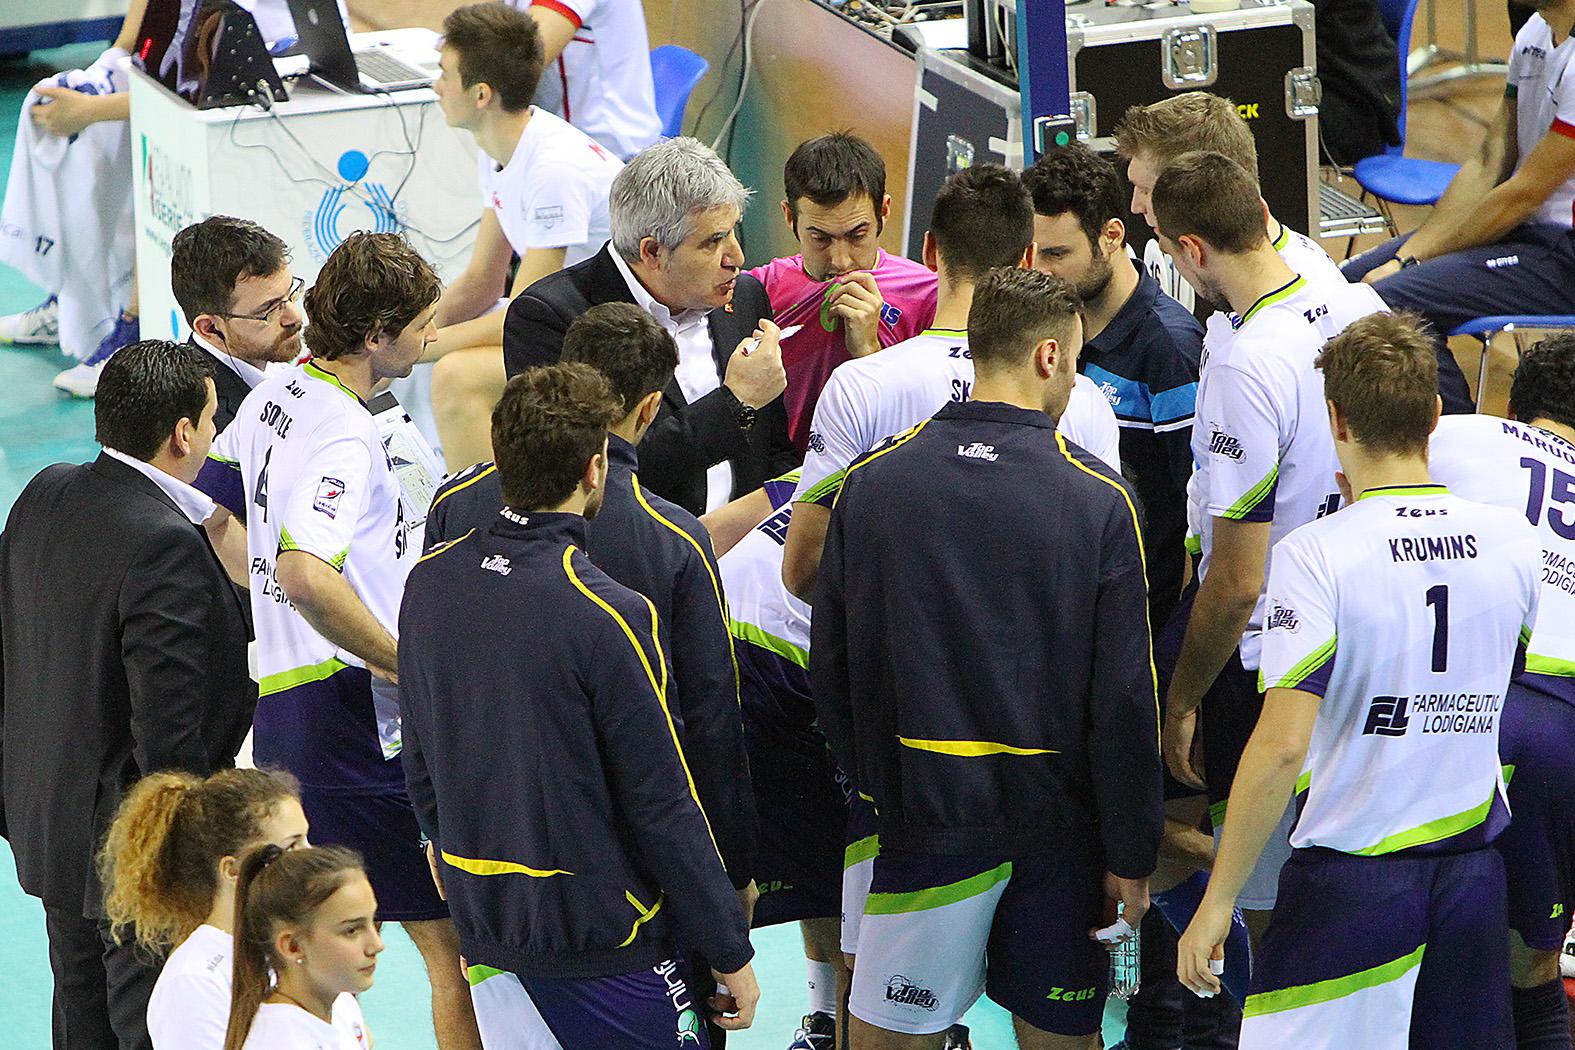 Foto: Top Volley Latina